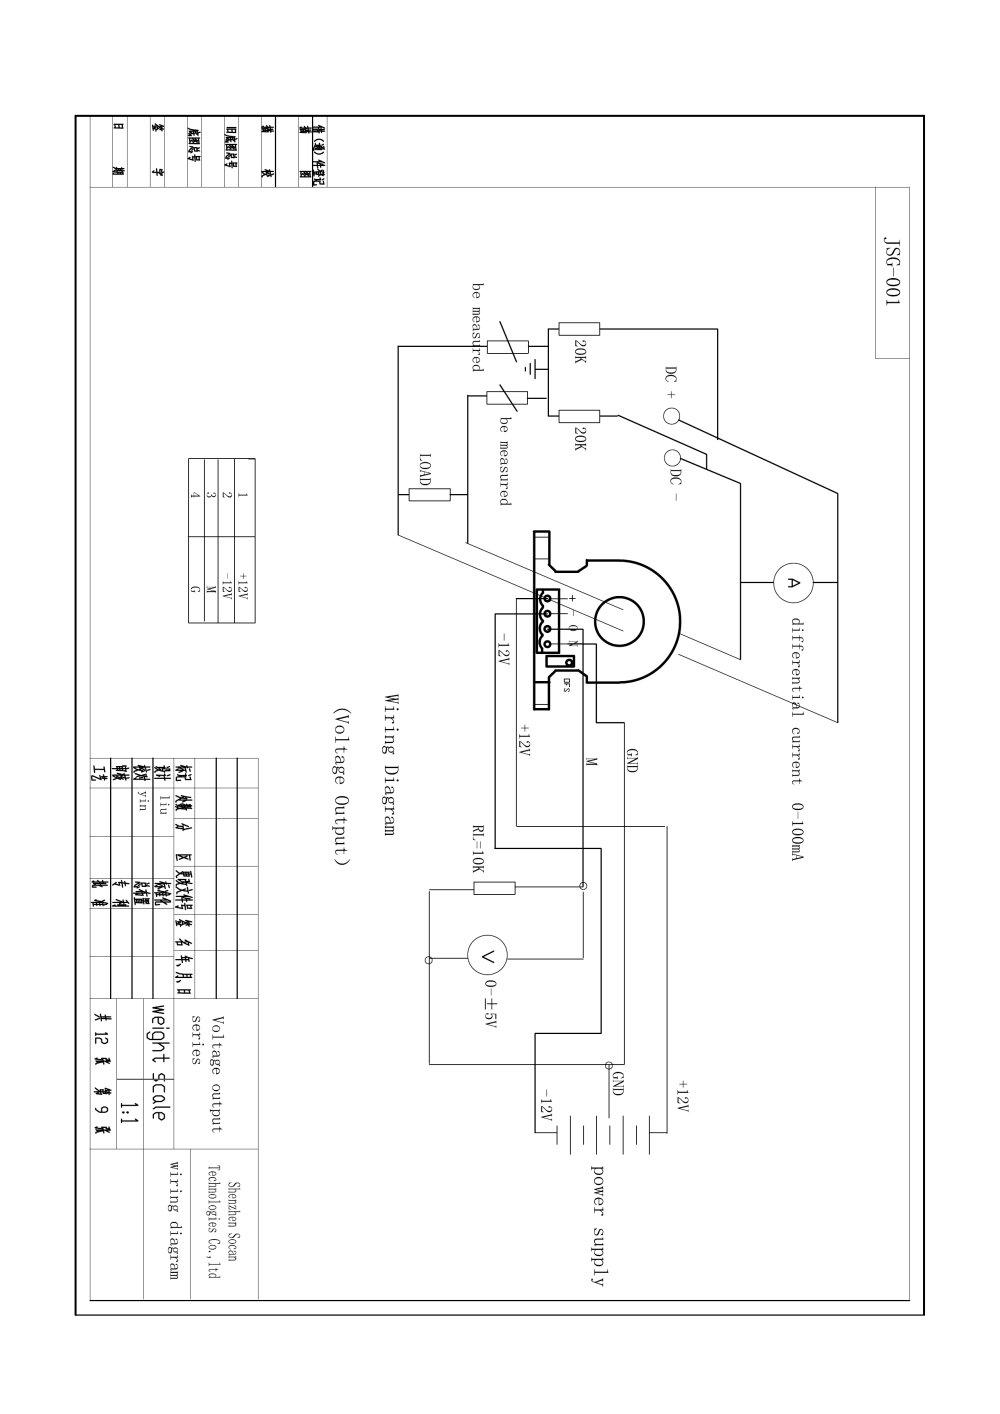 medium resolution of direct current wiring diagrams simple wiring schema wind turbine wiring dc leakage current sensor scd series